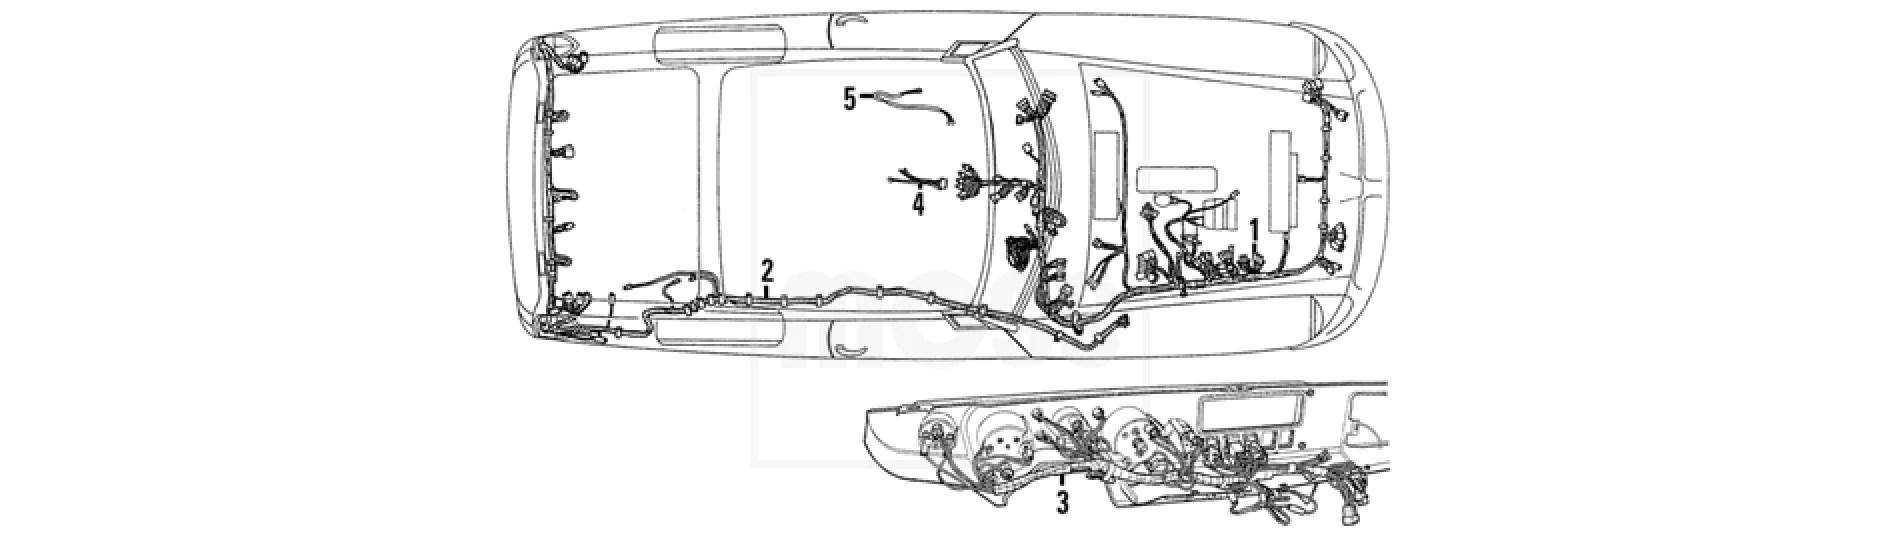 medium resolution of mgb fuse diagram